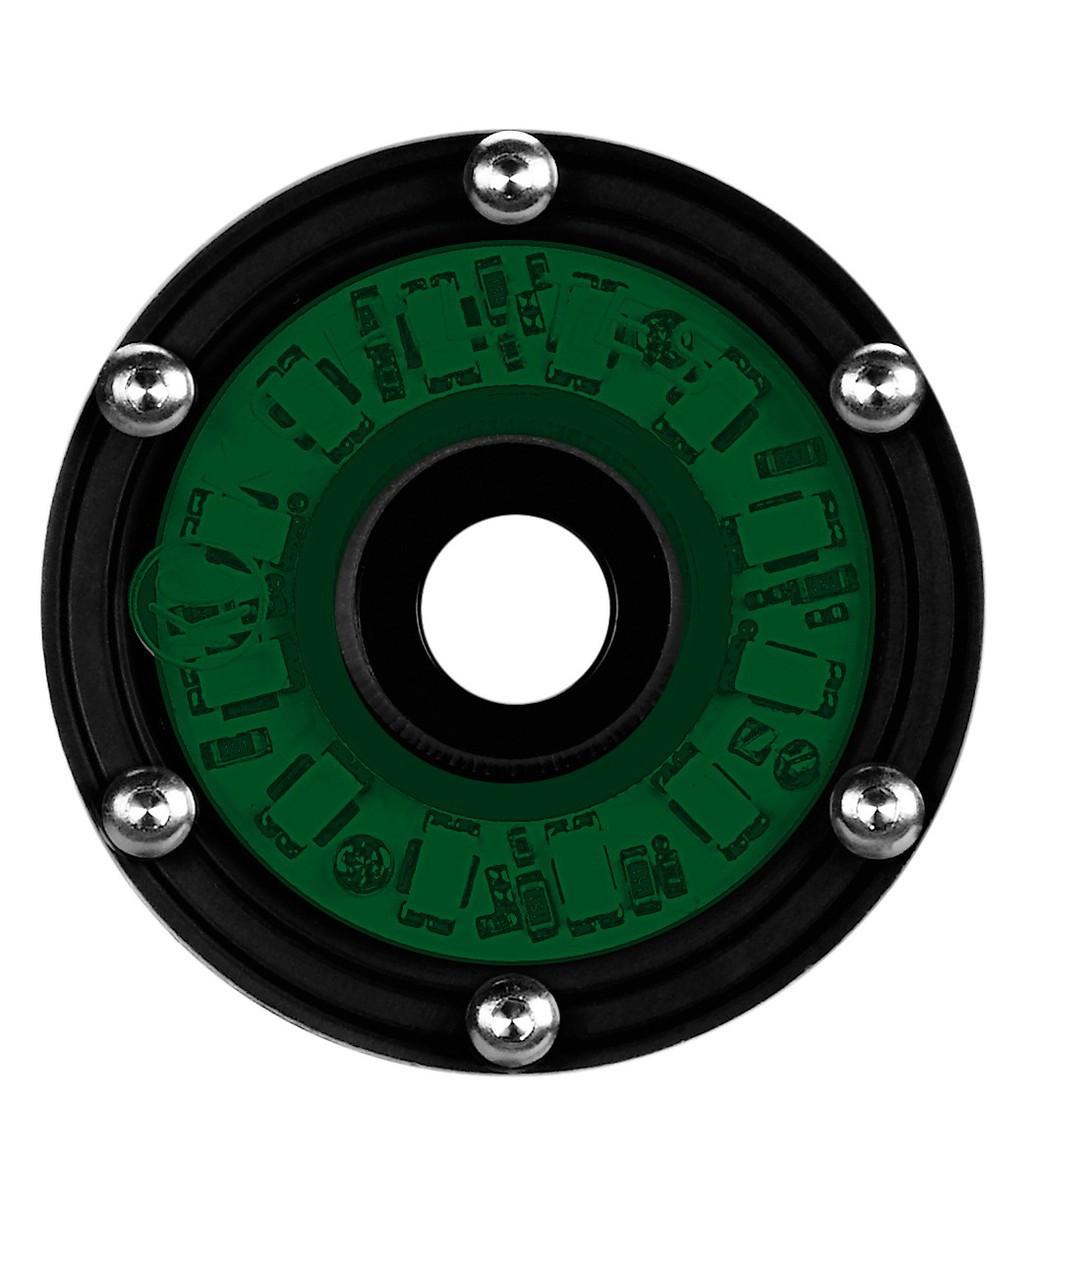 "KC Hilites 1355 Green 2"" Cyclone Round LED Light"